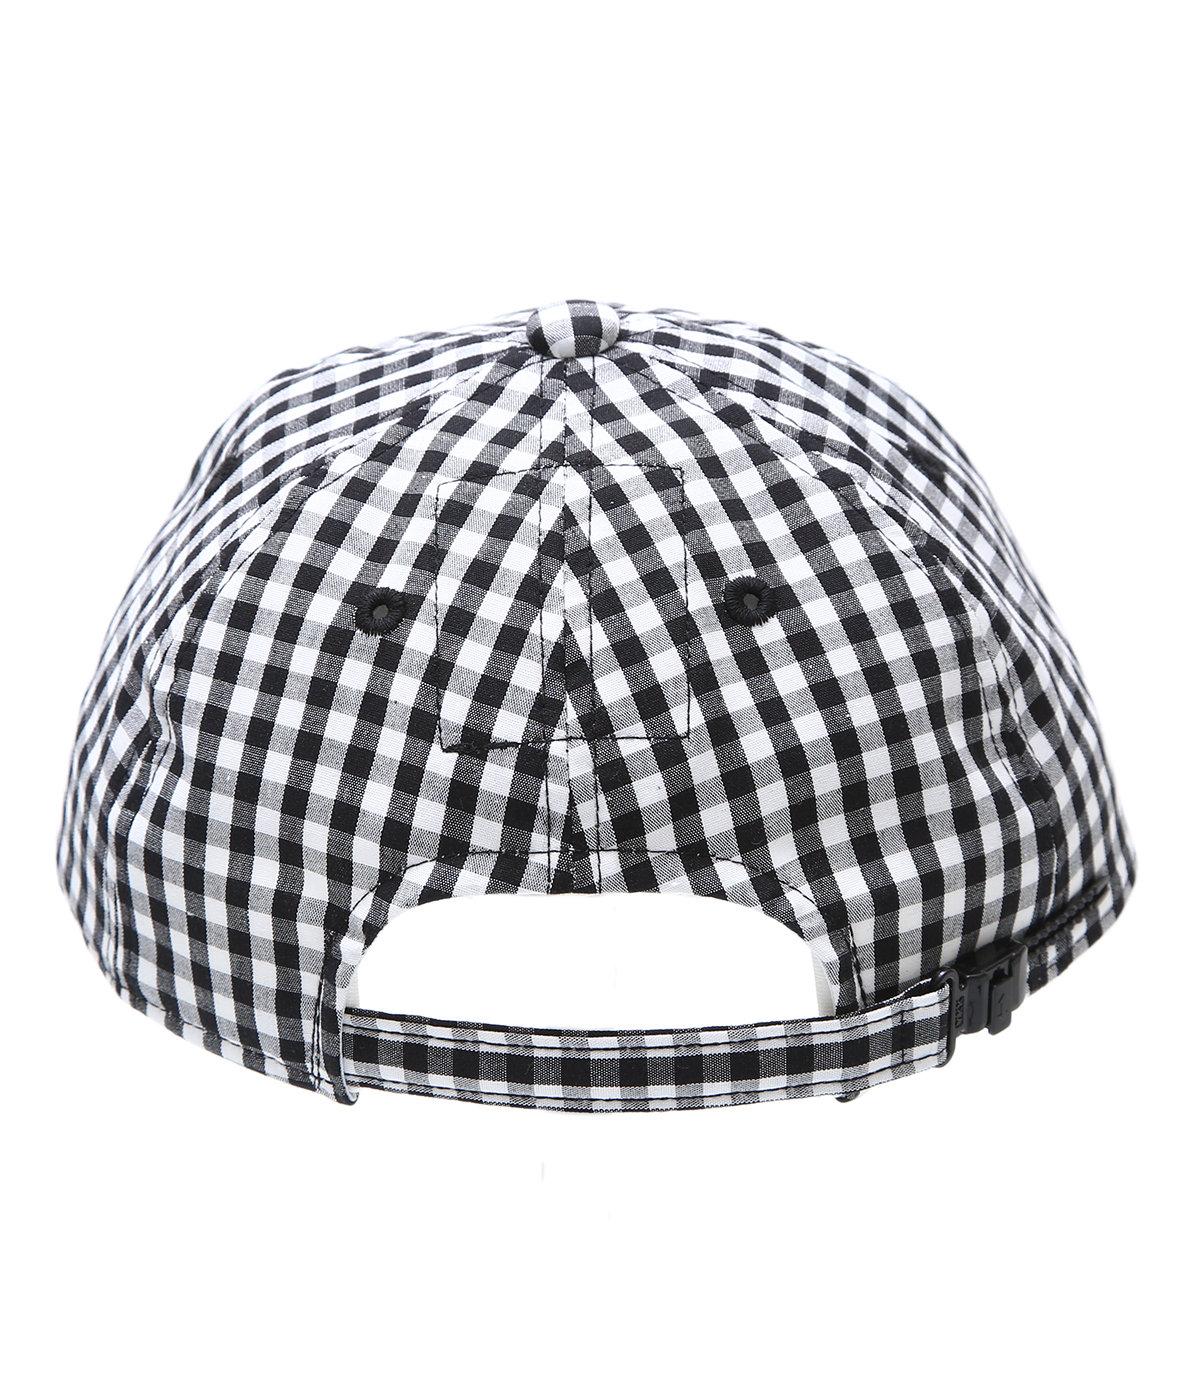 TENBOX TEAM CAP